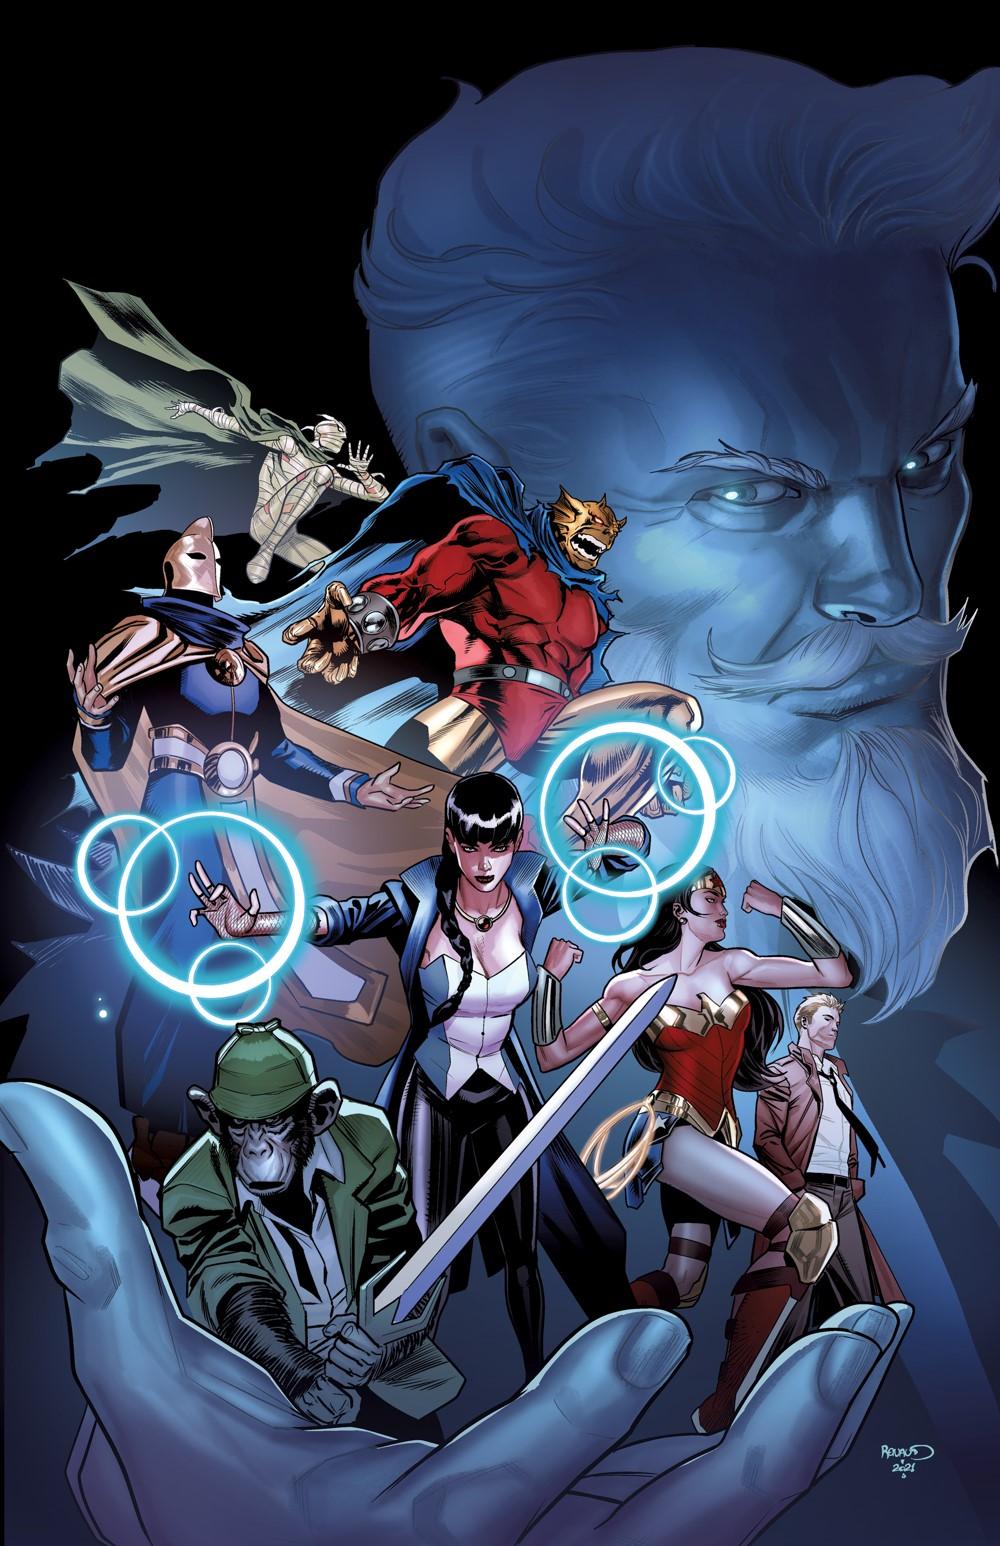 Justice-League-Dark-2021-Annual-Cv1-Renaud-variant DC Comics November 2021 Solicitations